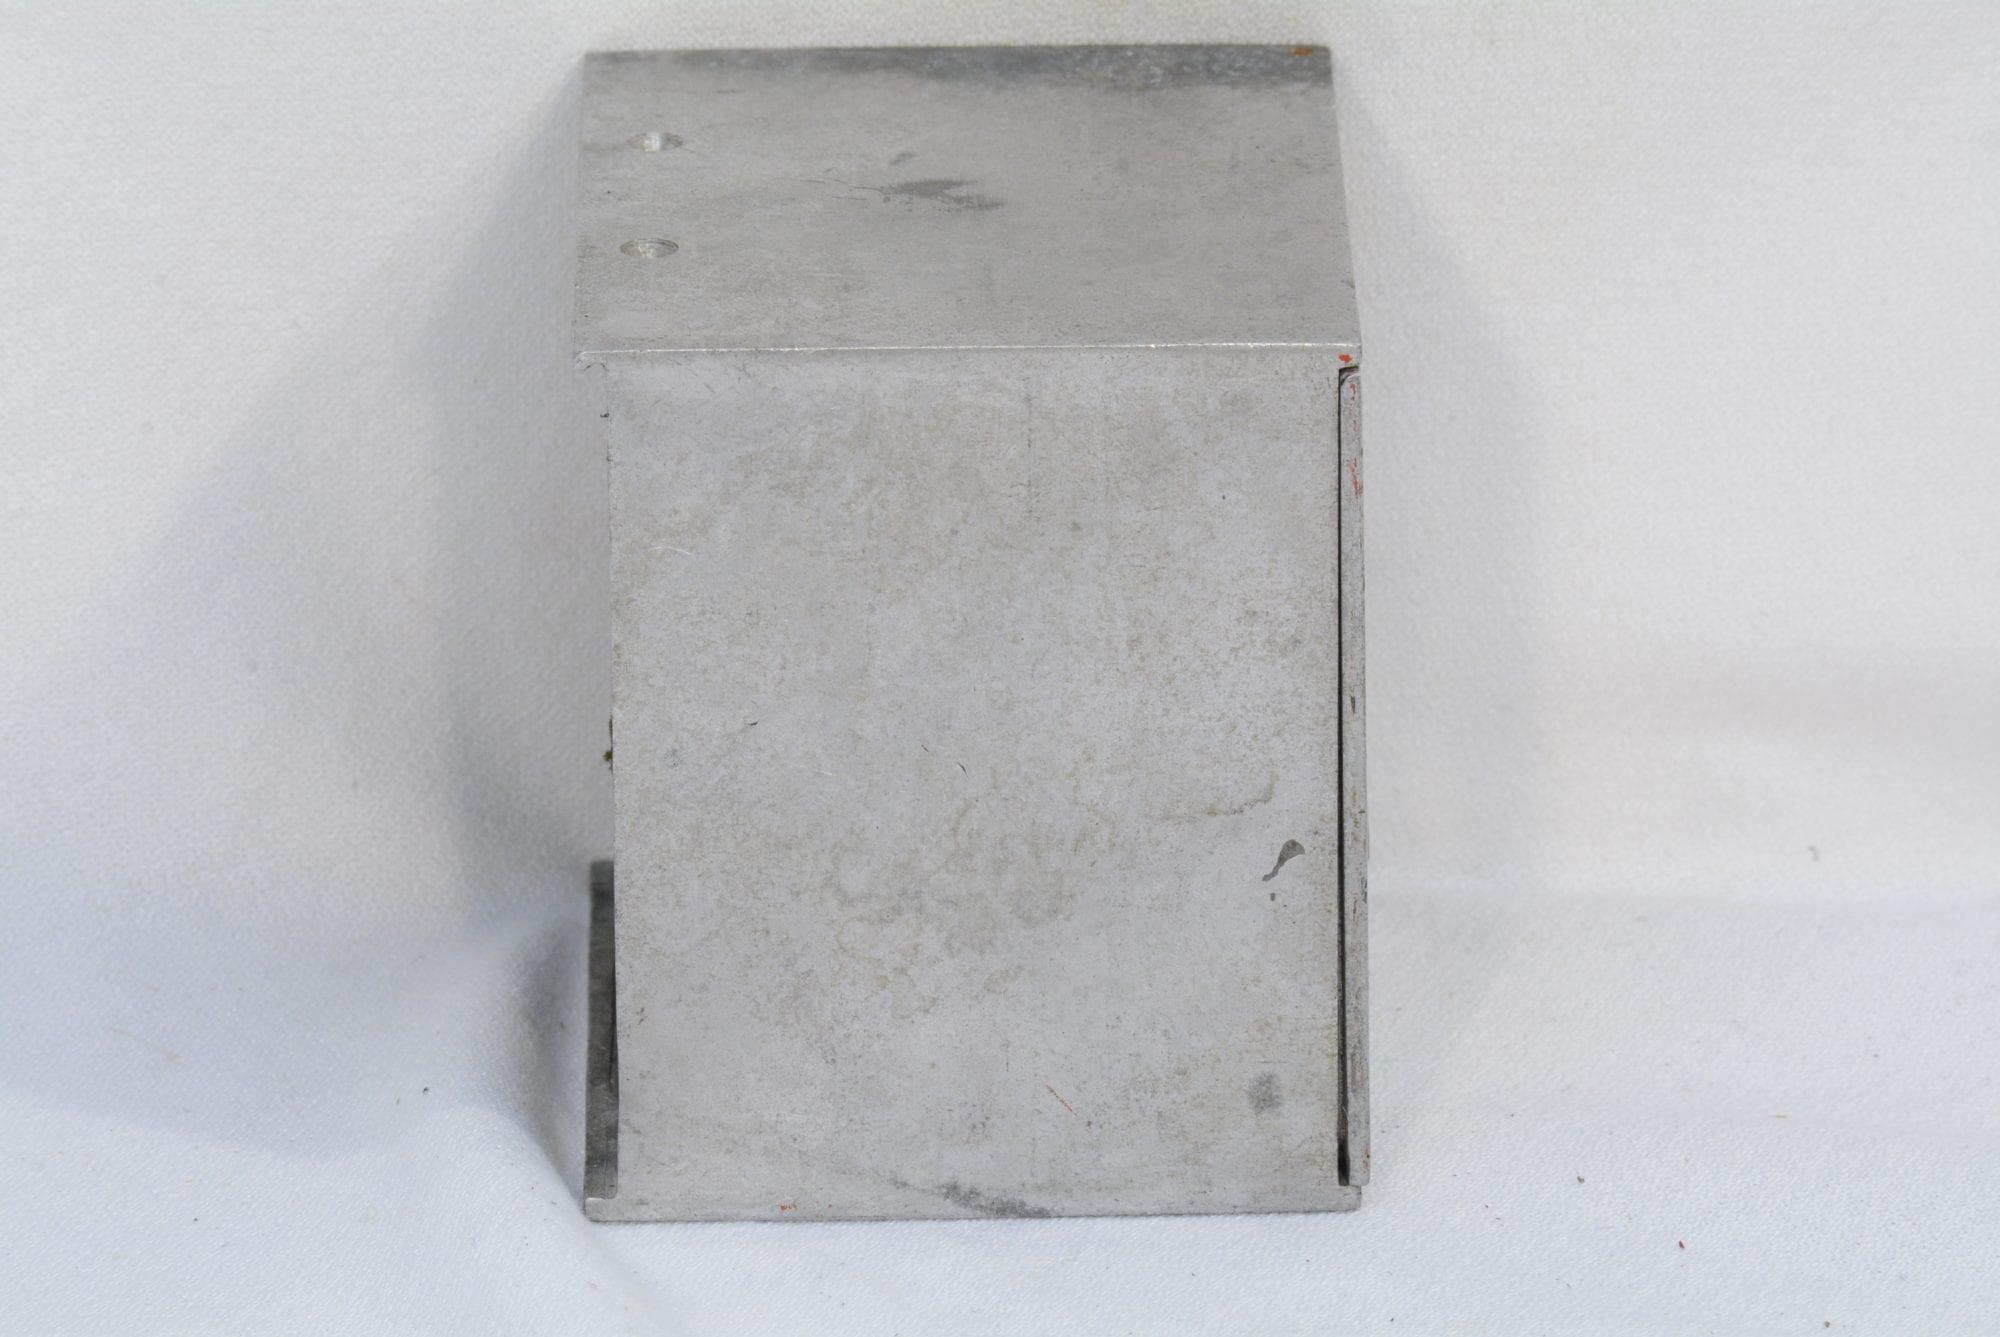 Diebold Safe Lock - Wayne Alarm Systems